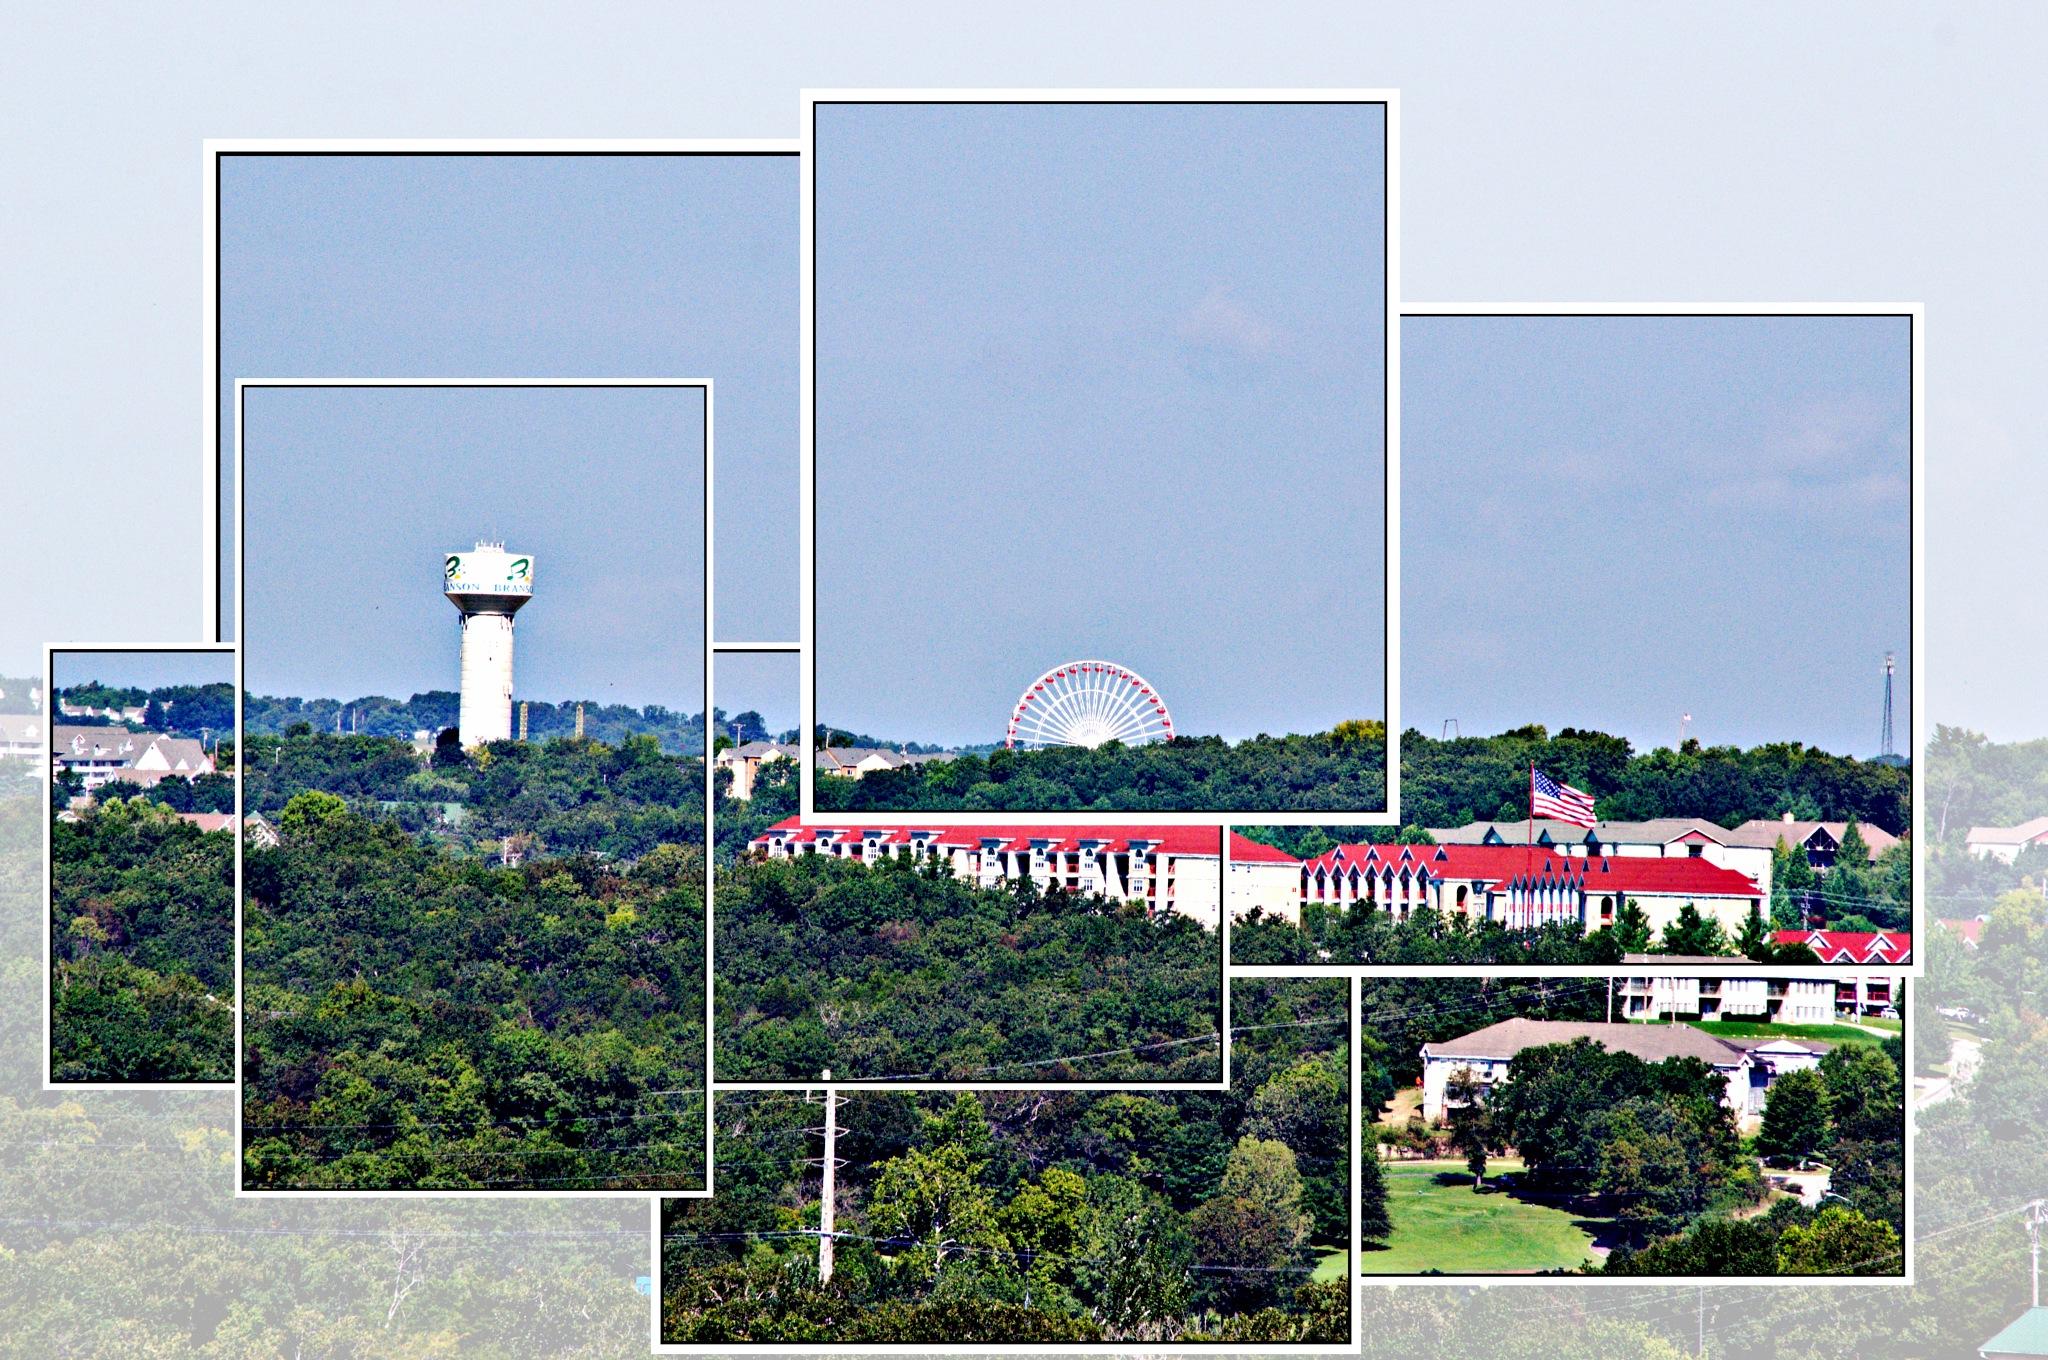 Branson Ferriss Wheel Lookout Point Montage by Debbie Bridges